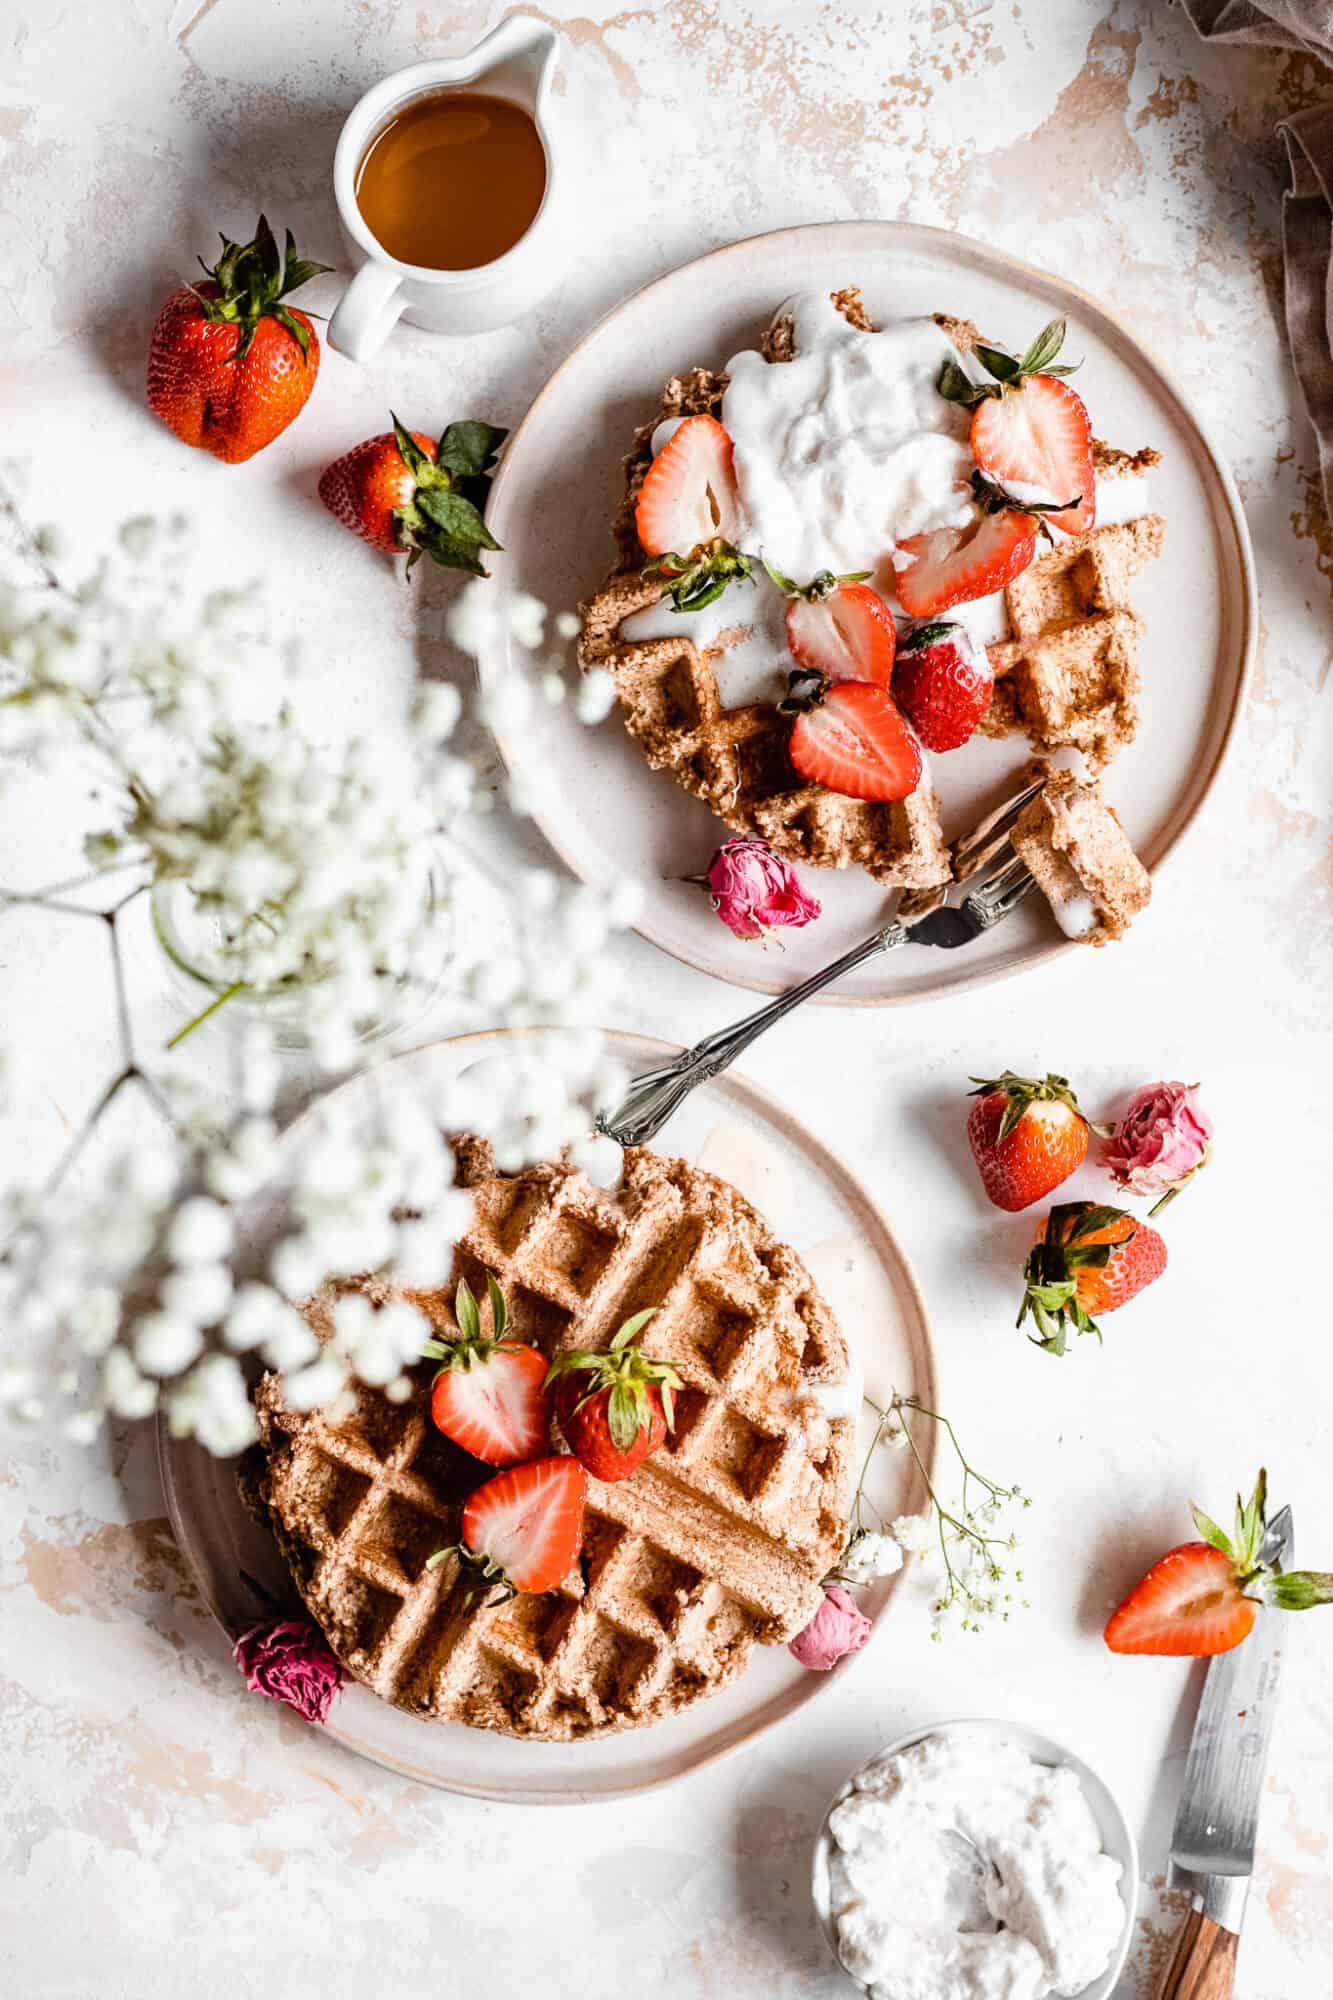 plates of vegan belong waffles